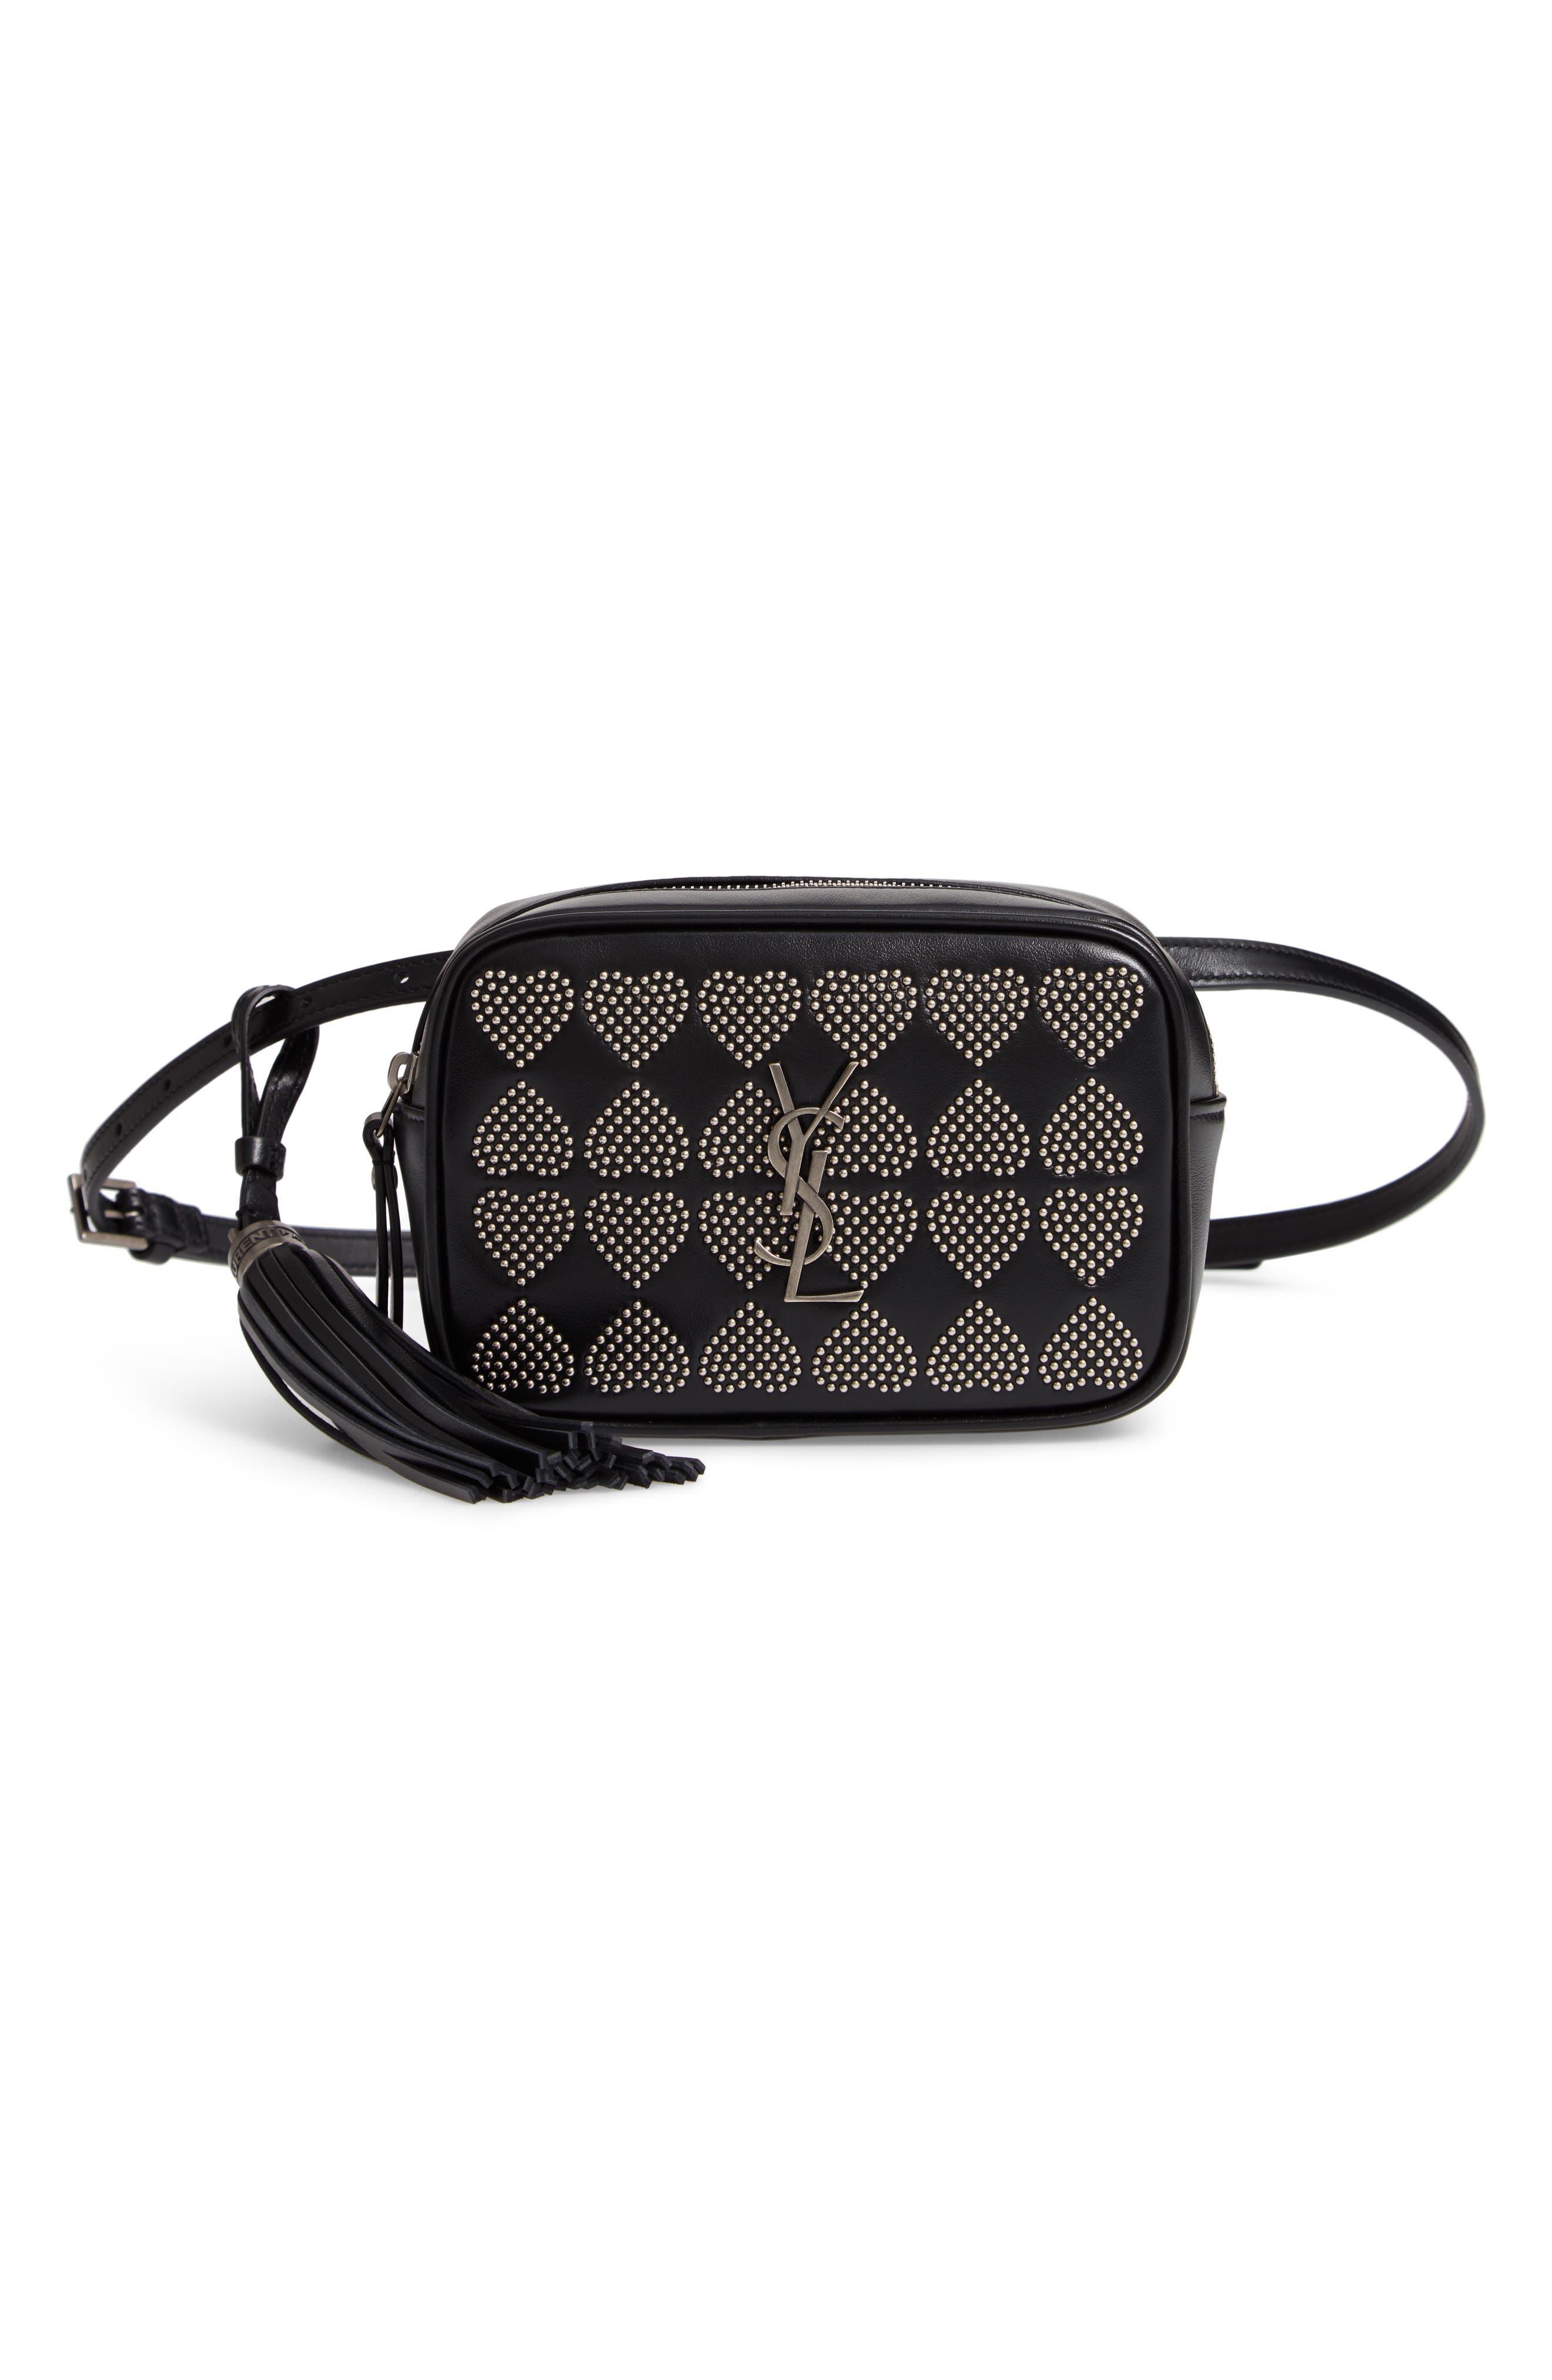 Micro Lou Stud Hearts Calfskin Leather Belt Bag,                             Main thumbnail 1, color,                             NOIR